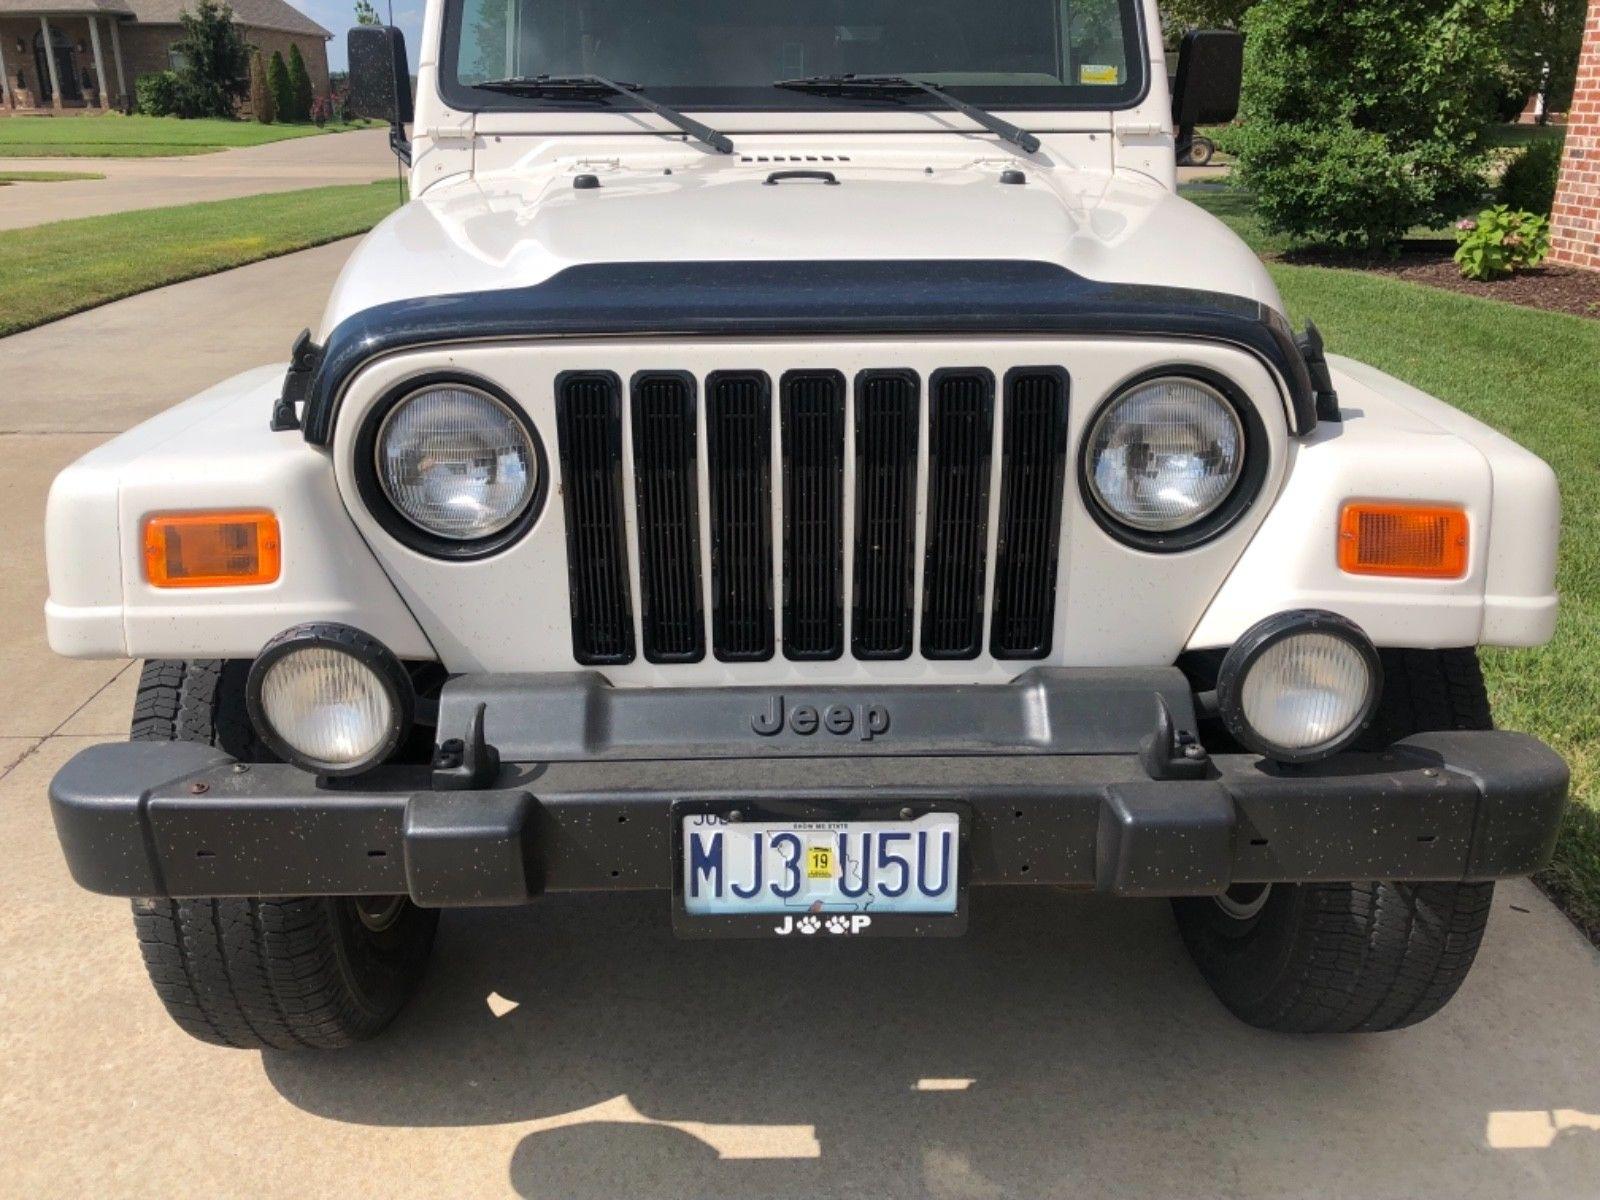 Awesome 2001 Jeep Wrangler Sahara TJ 2001 Jeep Wrangler Sahara TJ White Tan  Hard Top / Soft Top Low Miles Automatic 2018